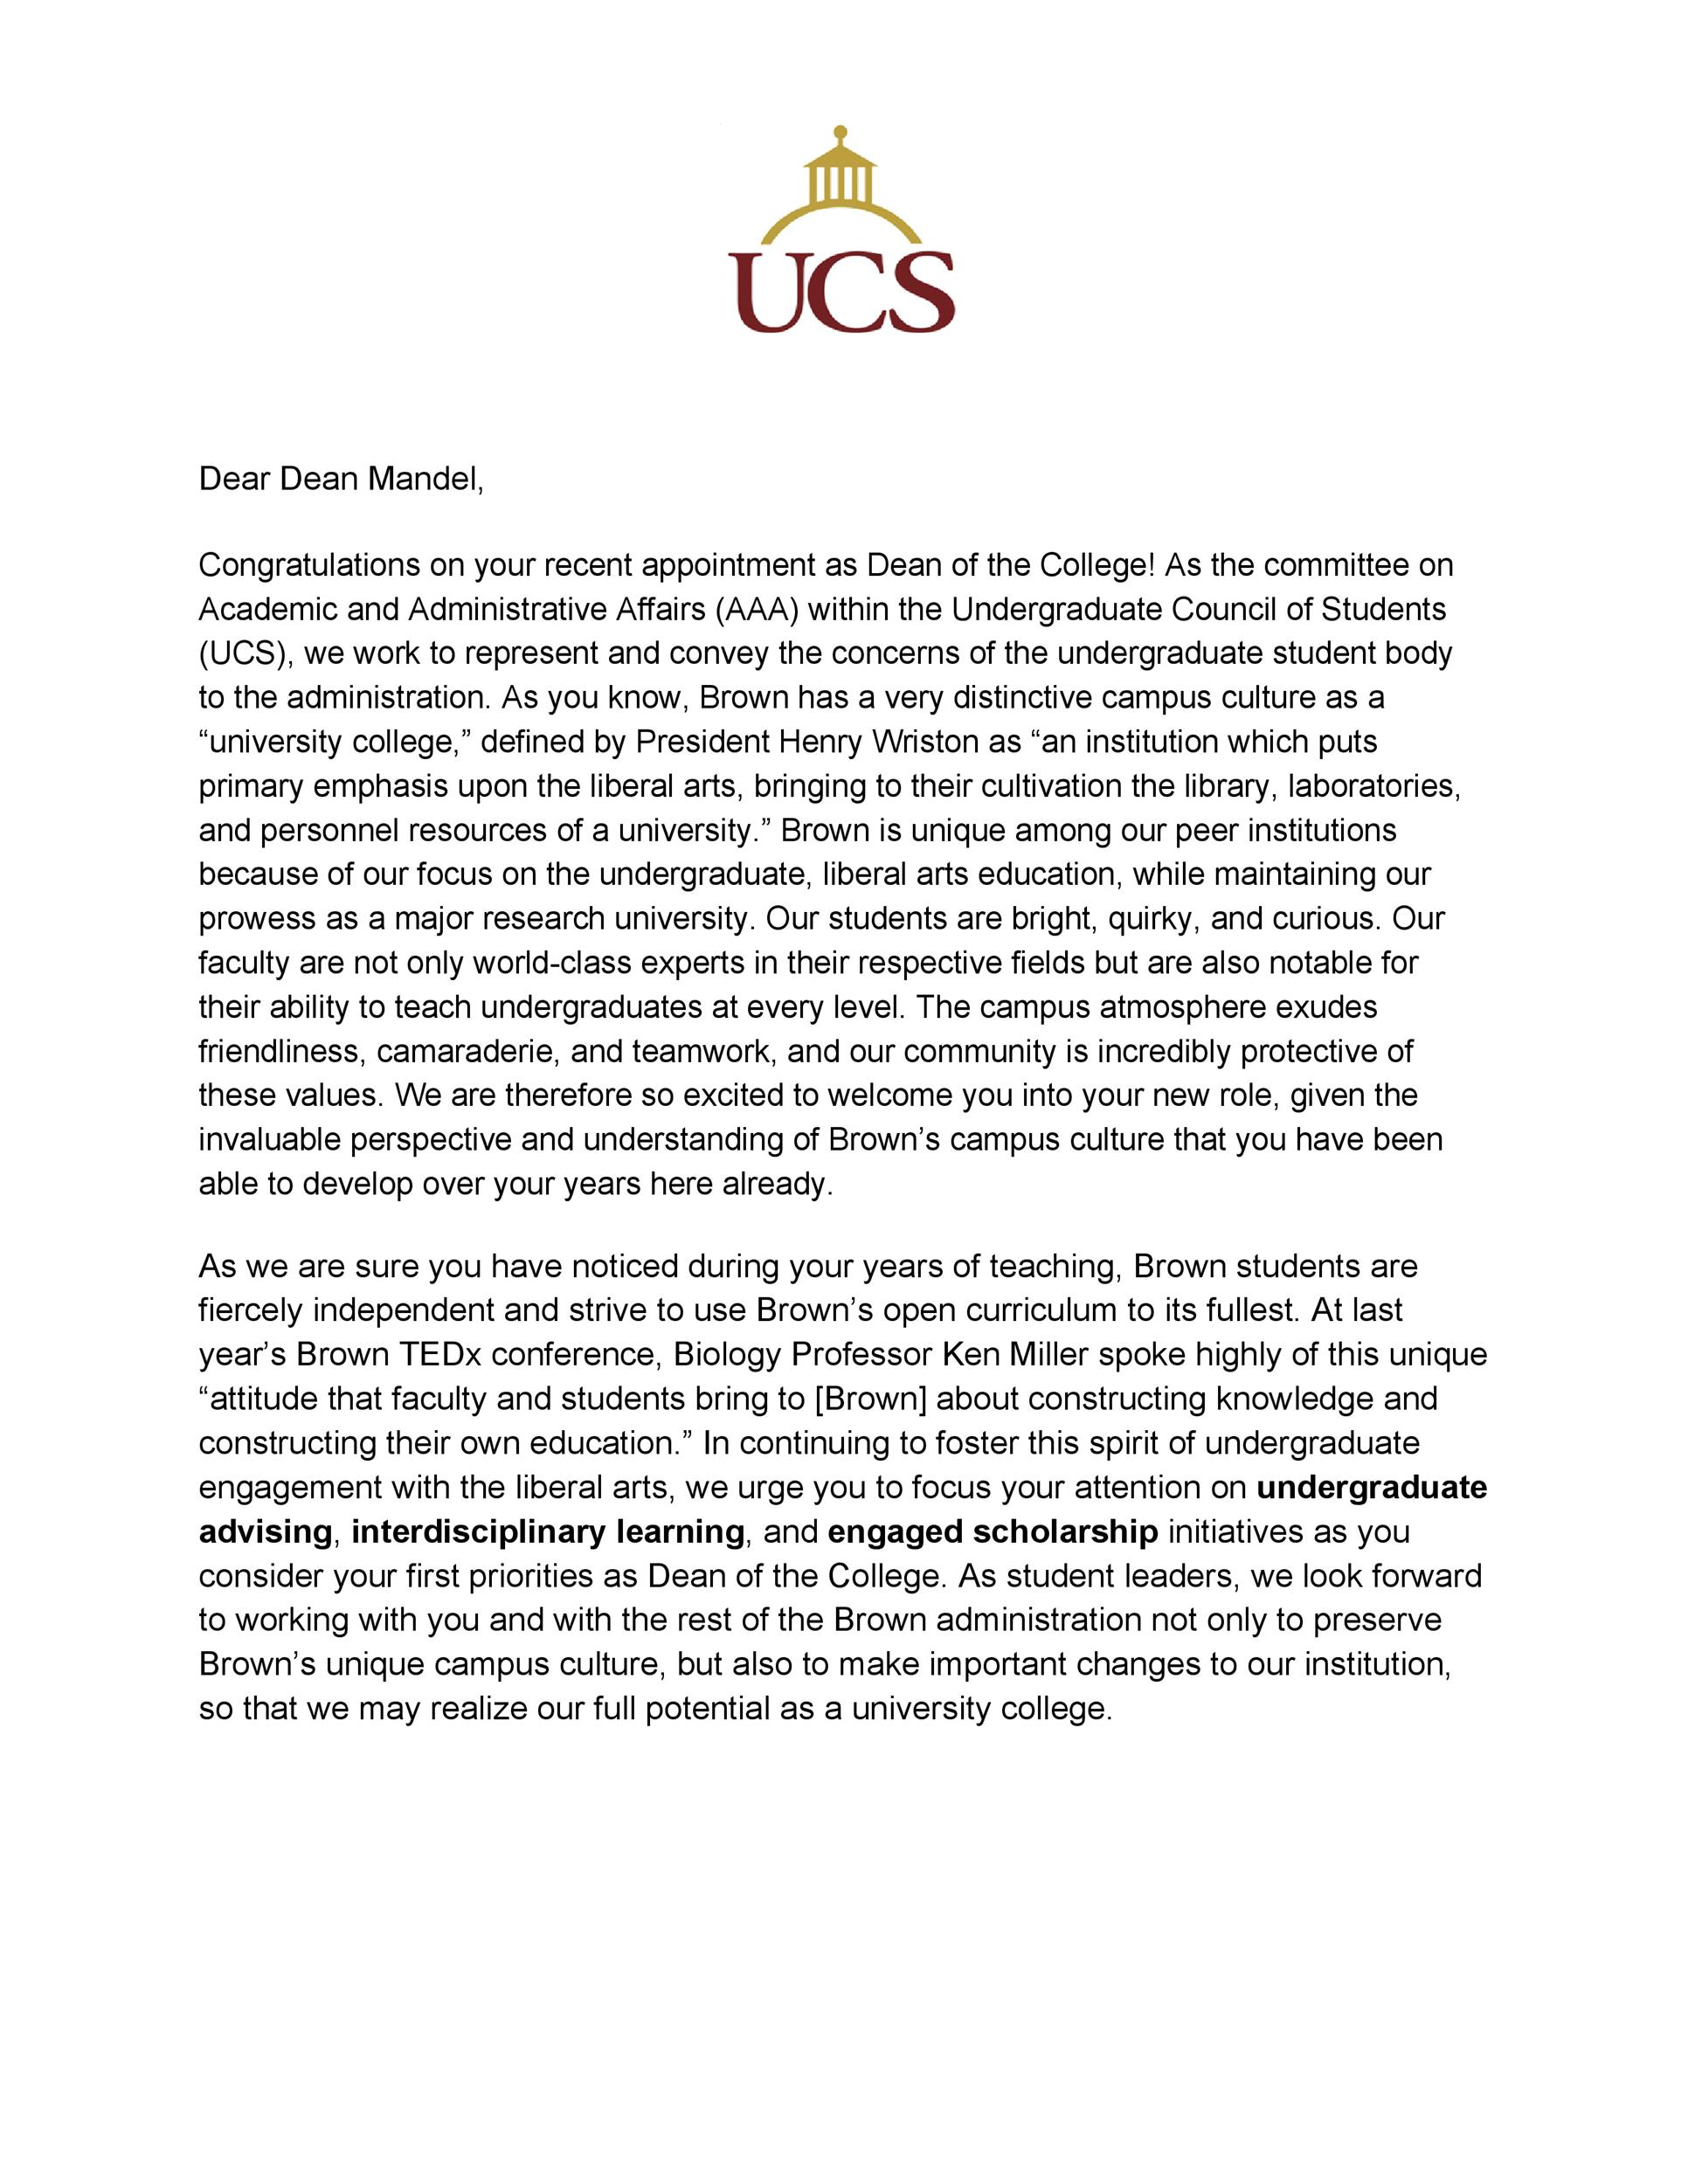 Free congratulations letter 20